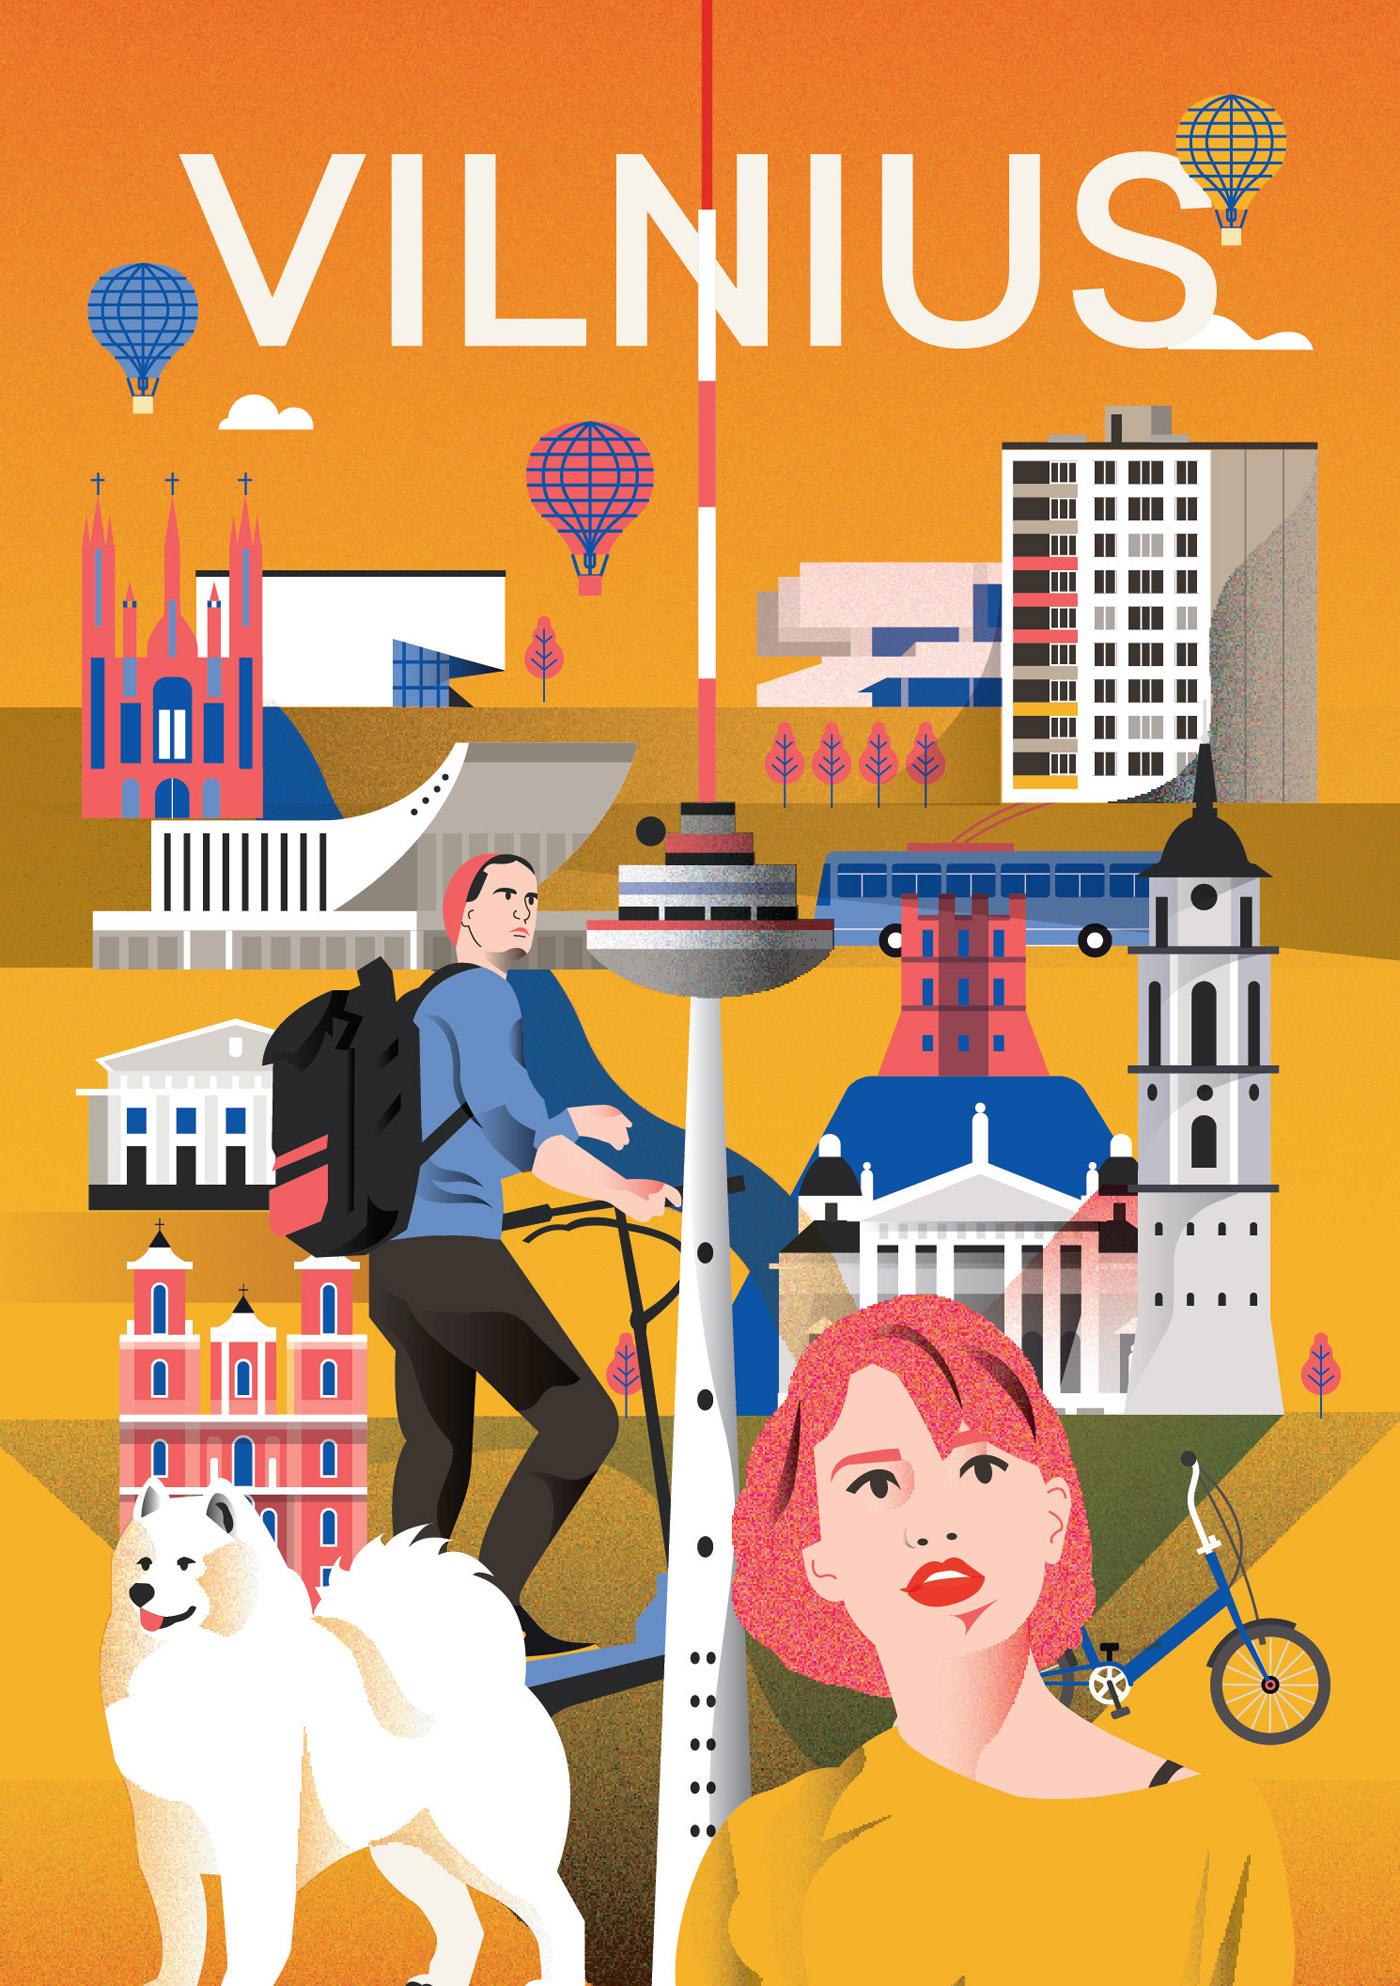 Vilnius city poster by Arunas Kacinskas